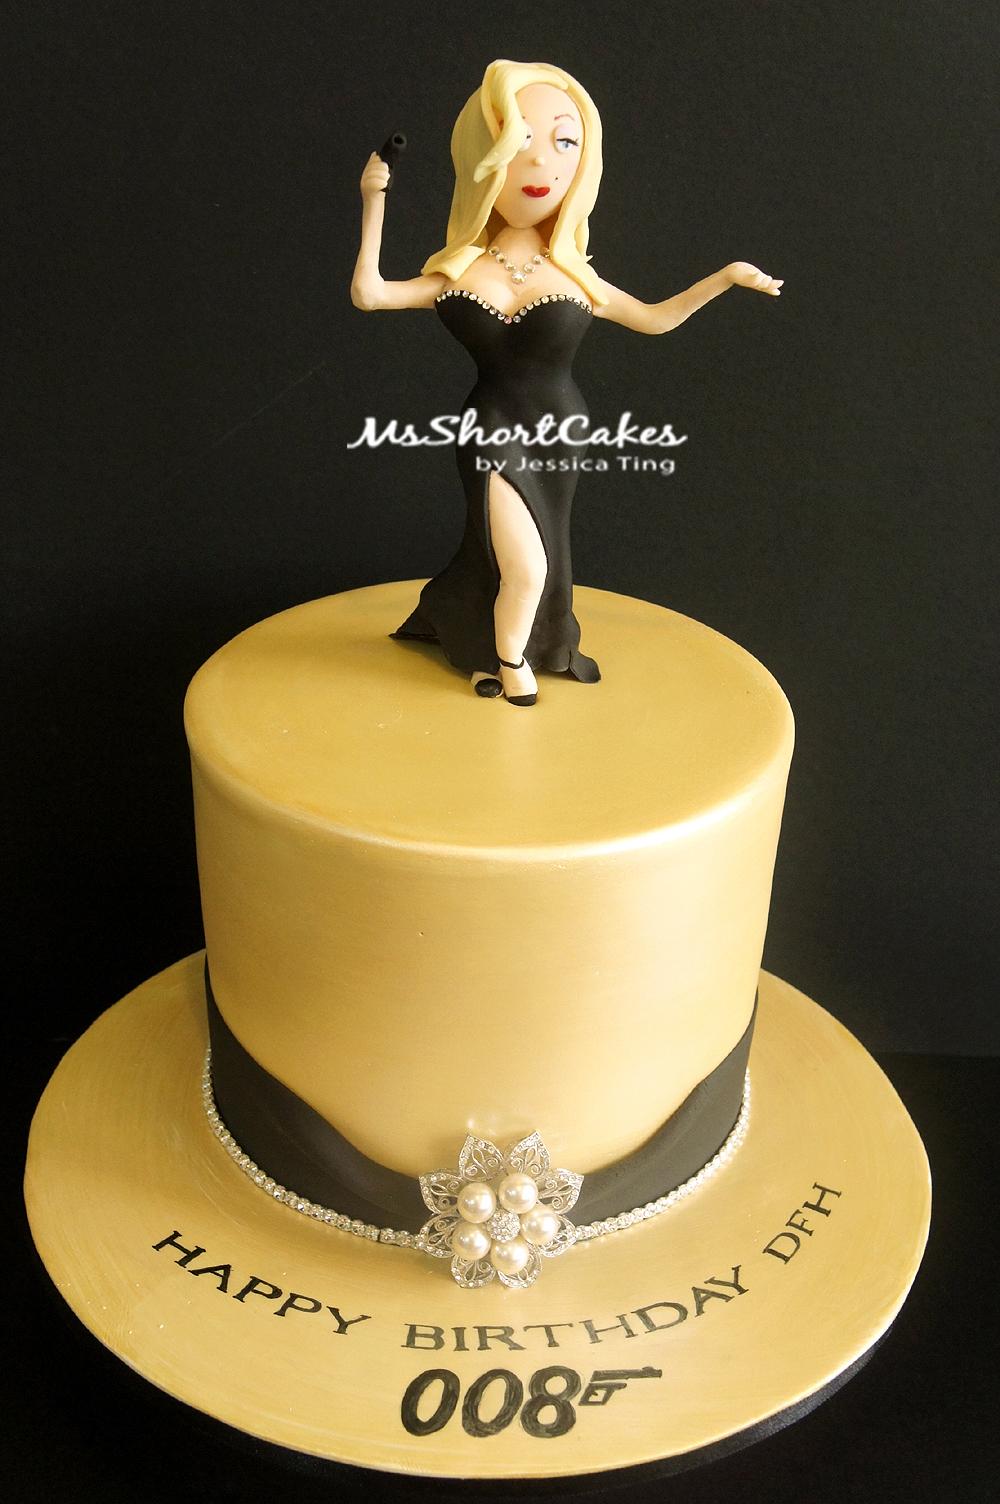 Cake Design James Bond : Miss Shortcakes: I love my job!